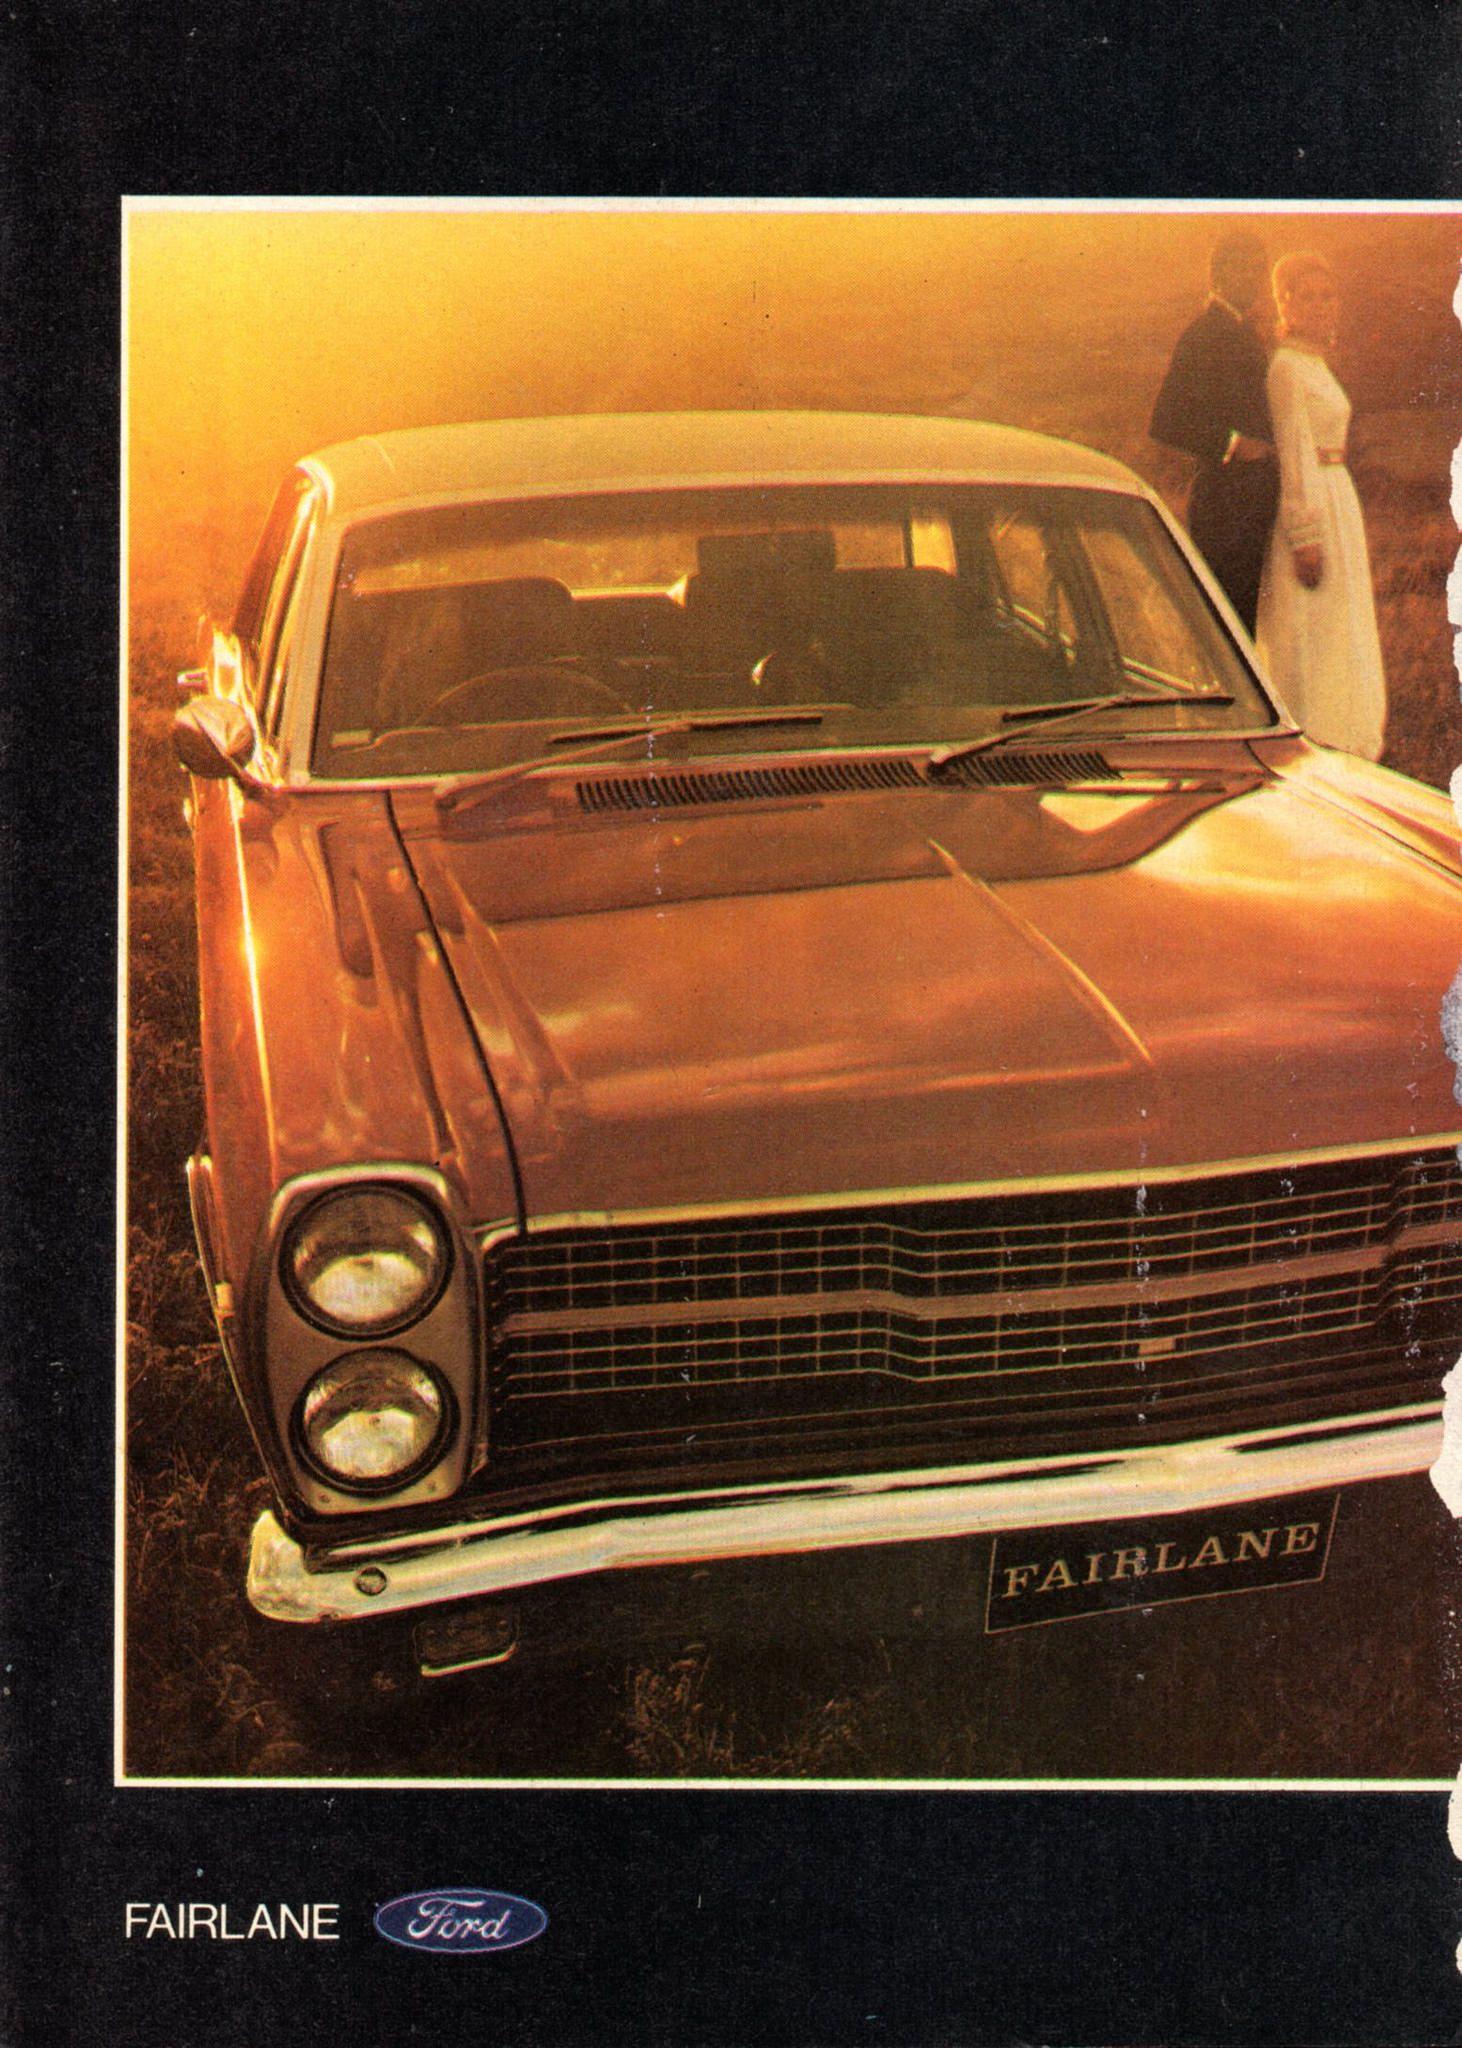 1971 Xy Ford Falcon Fairmont Zd Fairlane Page 5 Aussie Original